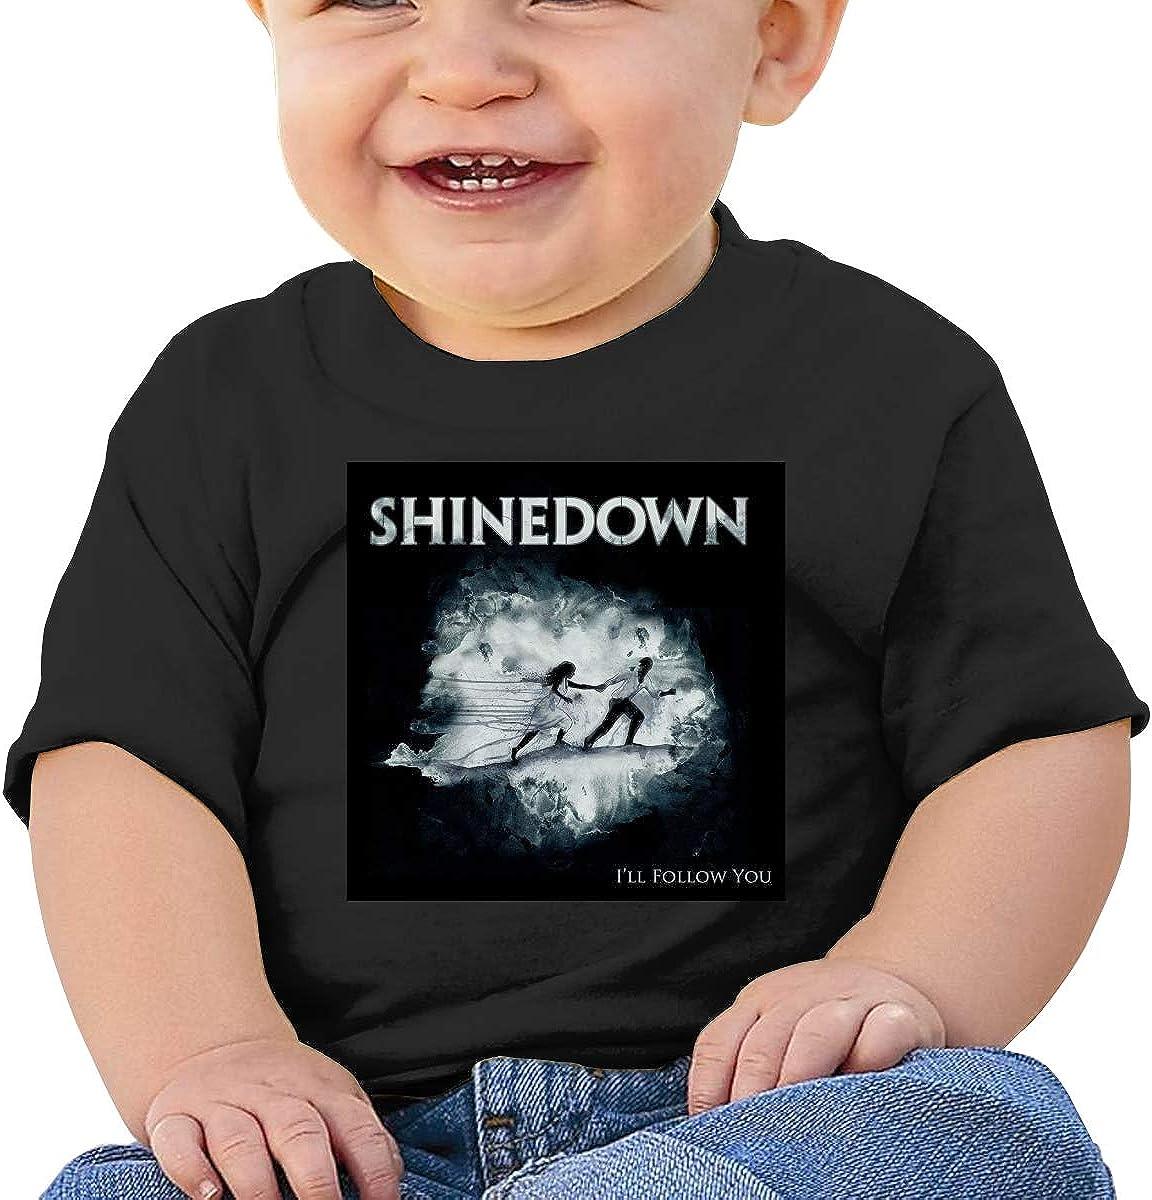 Kangtians Baby Shinedown Shirt Toddler Cotton Tee